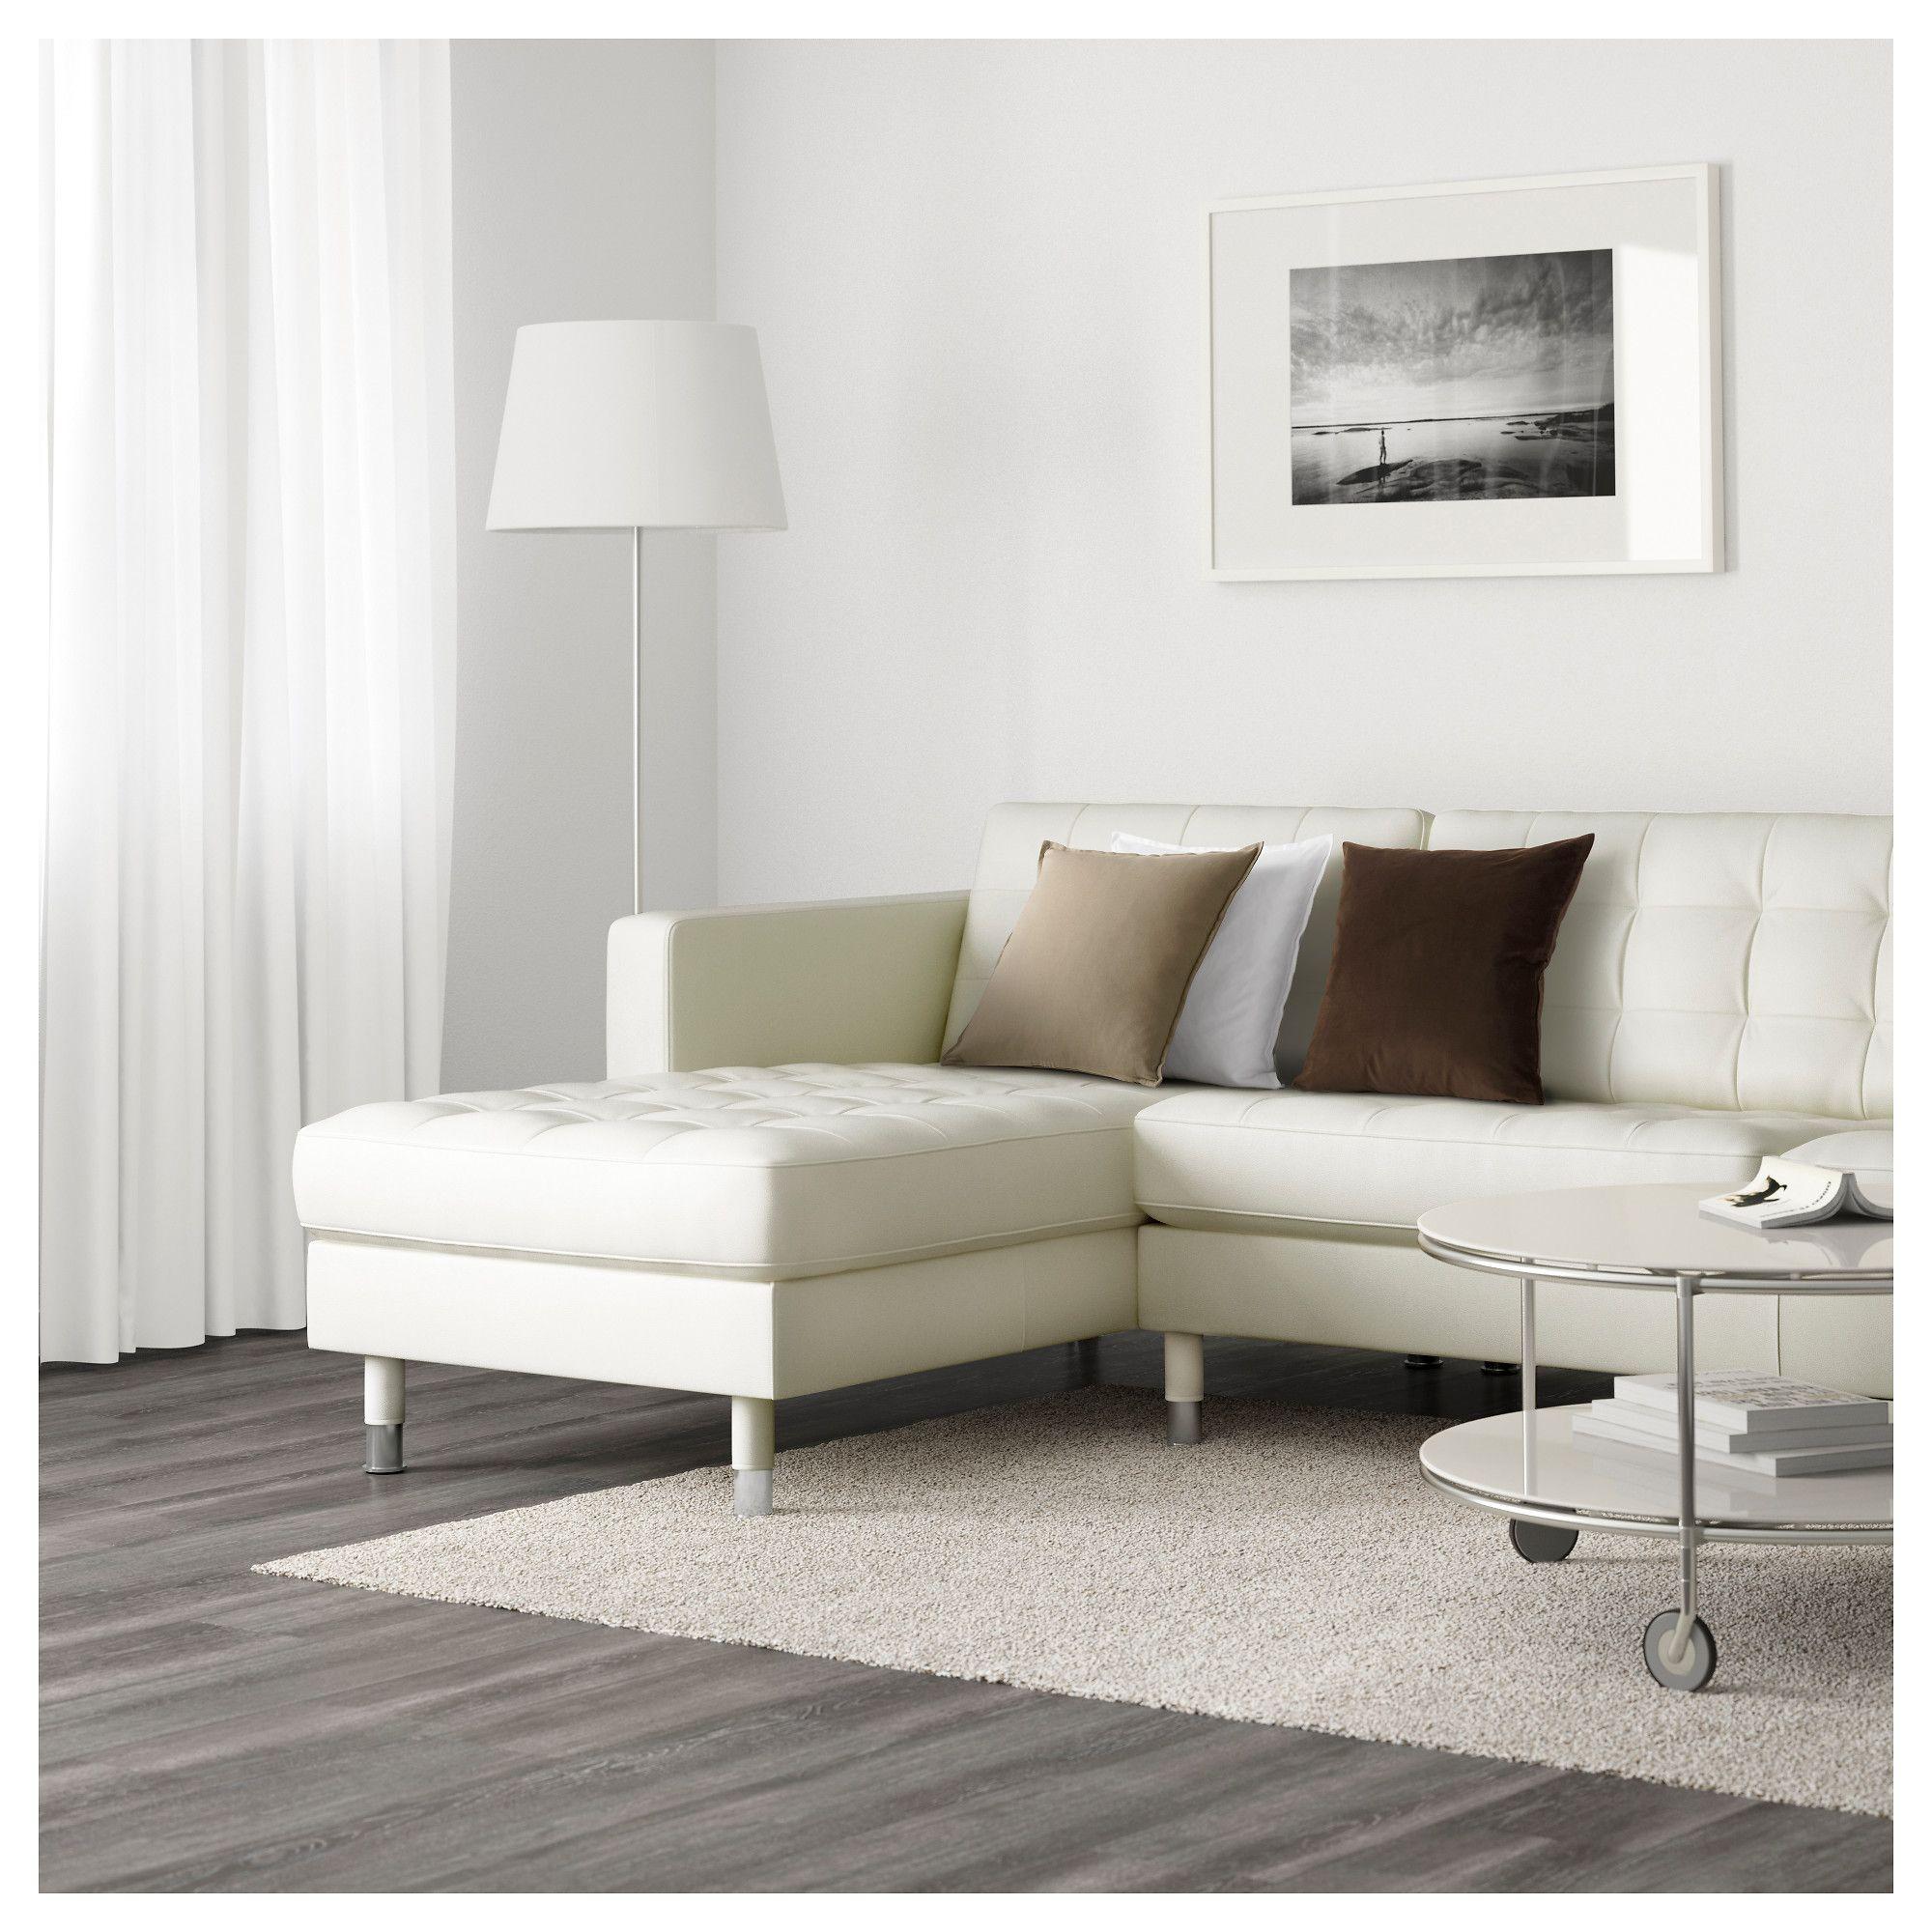 Furniture And Home Furnishings In 2019 House Stuff Landskrona